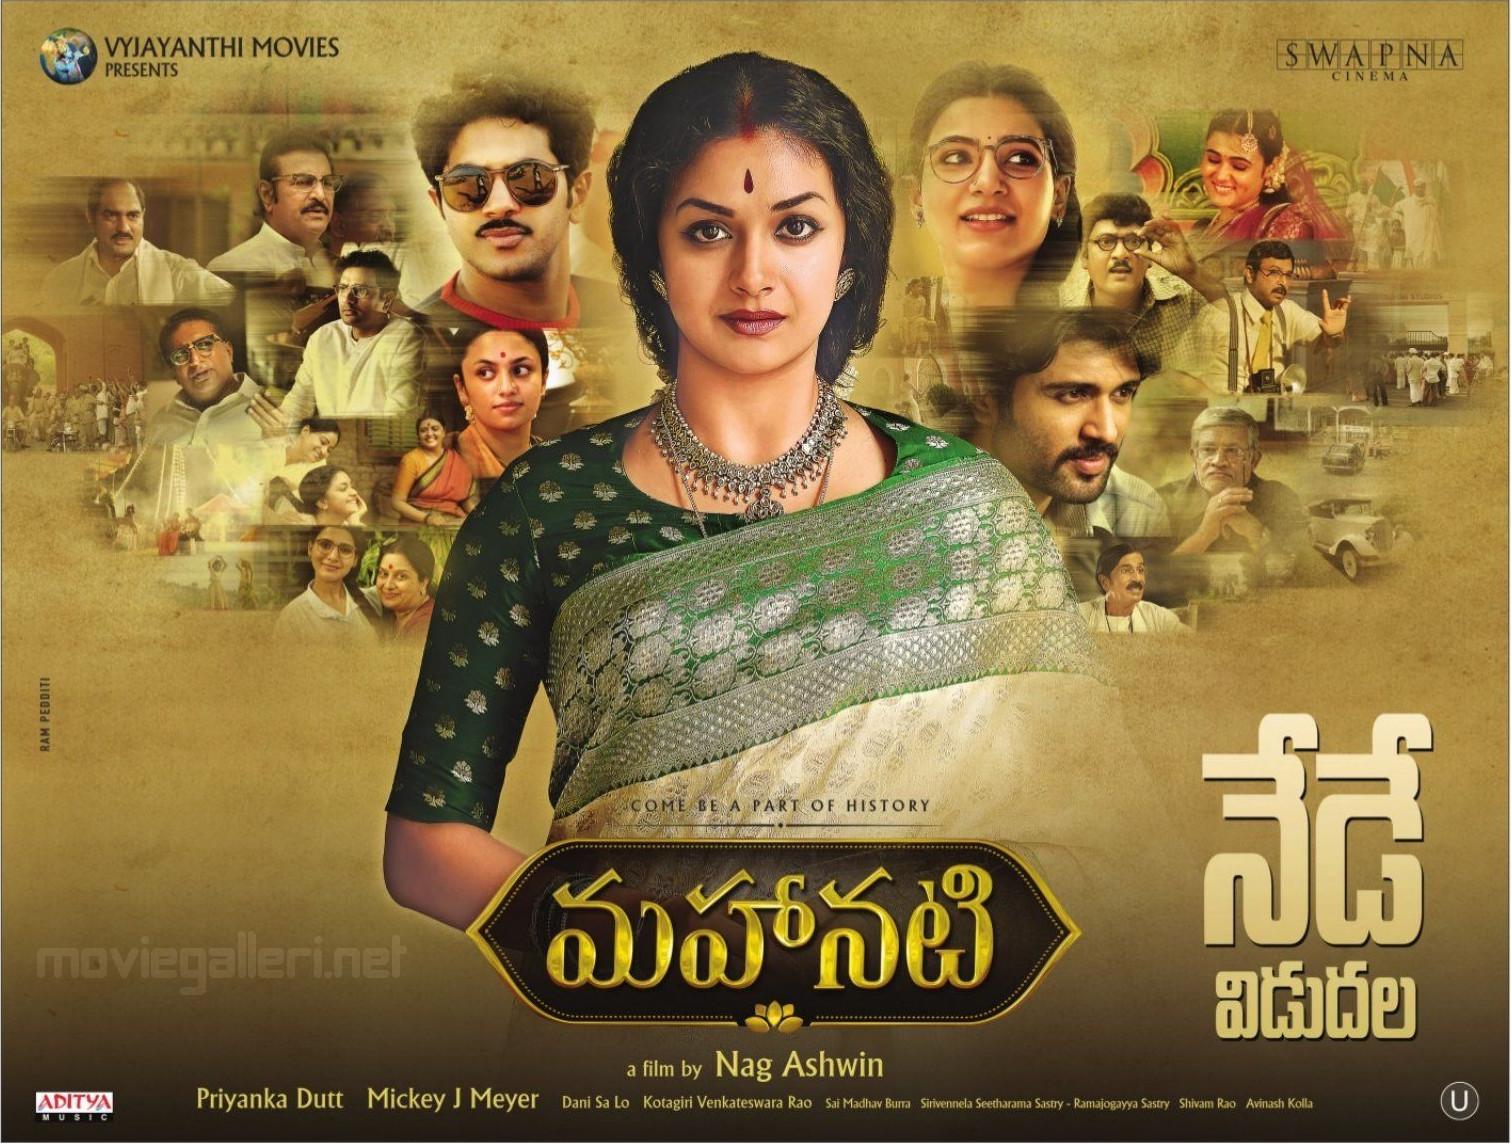 Keerthy Suresh Mahanati Movie Releasing Today Poster – New Movie Posters